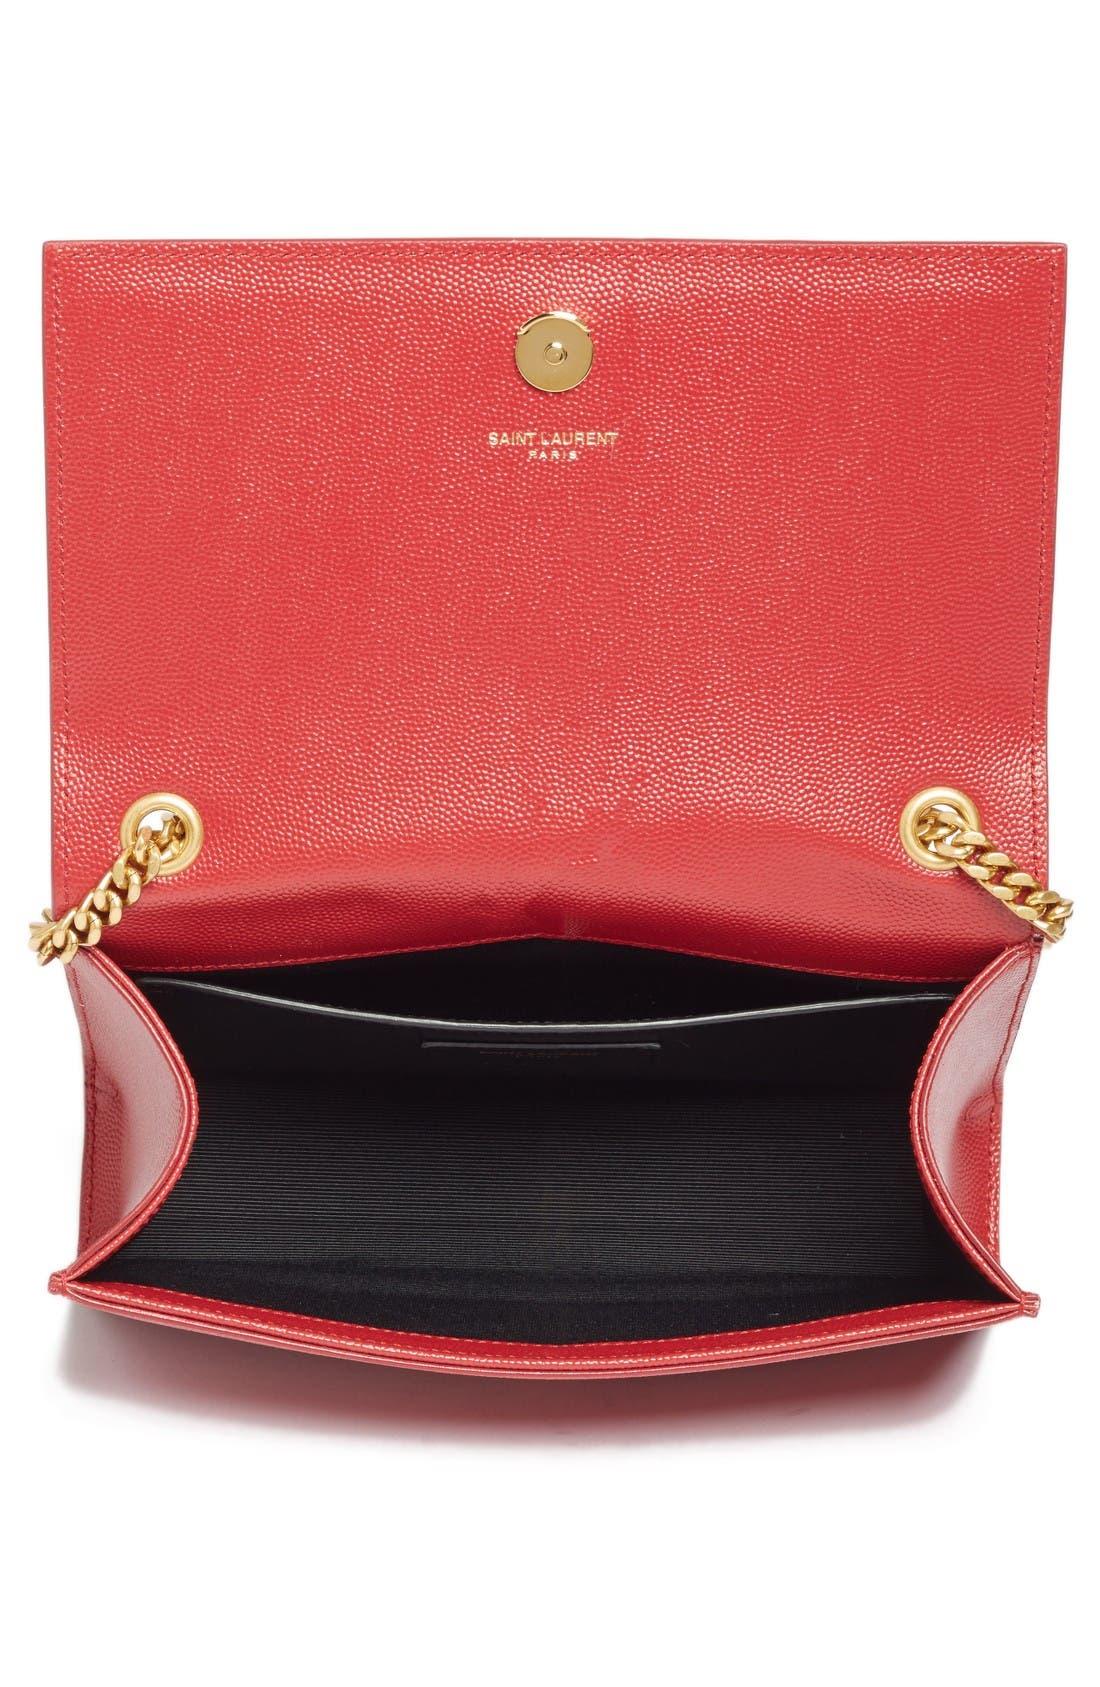 Alternate Image 3  - Saint Laurent Small Kate Calfskin Leather Crossbody Bag